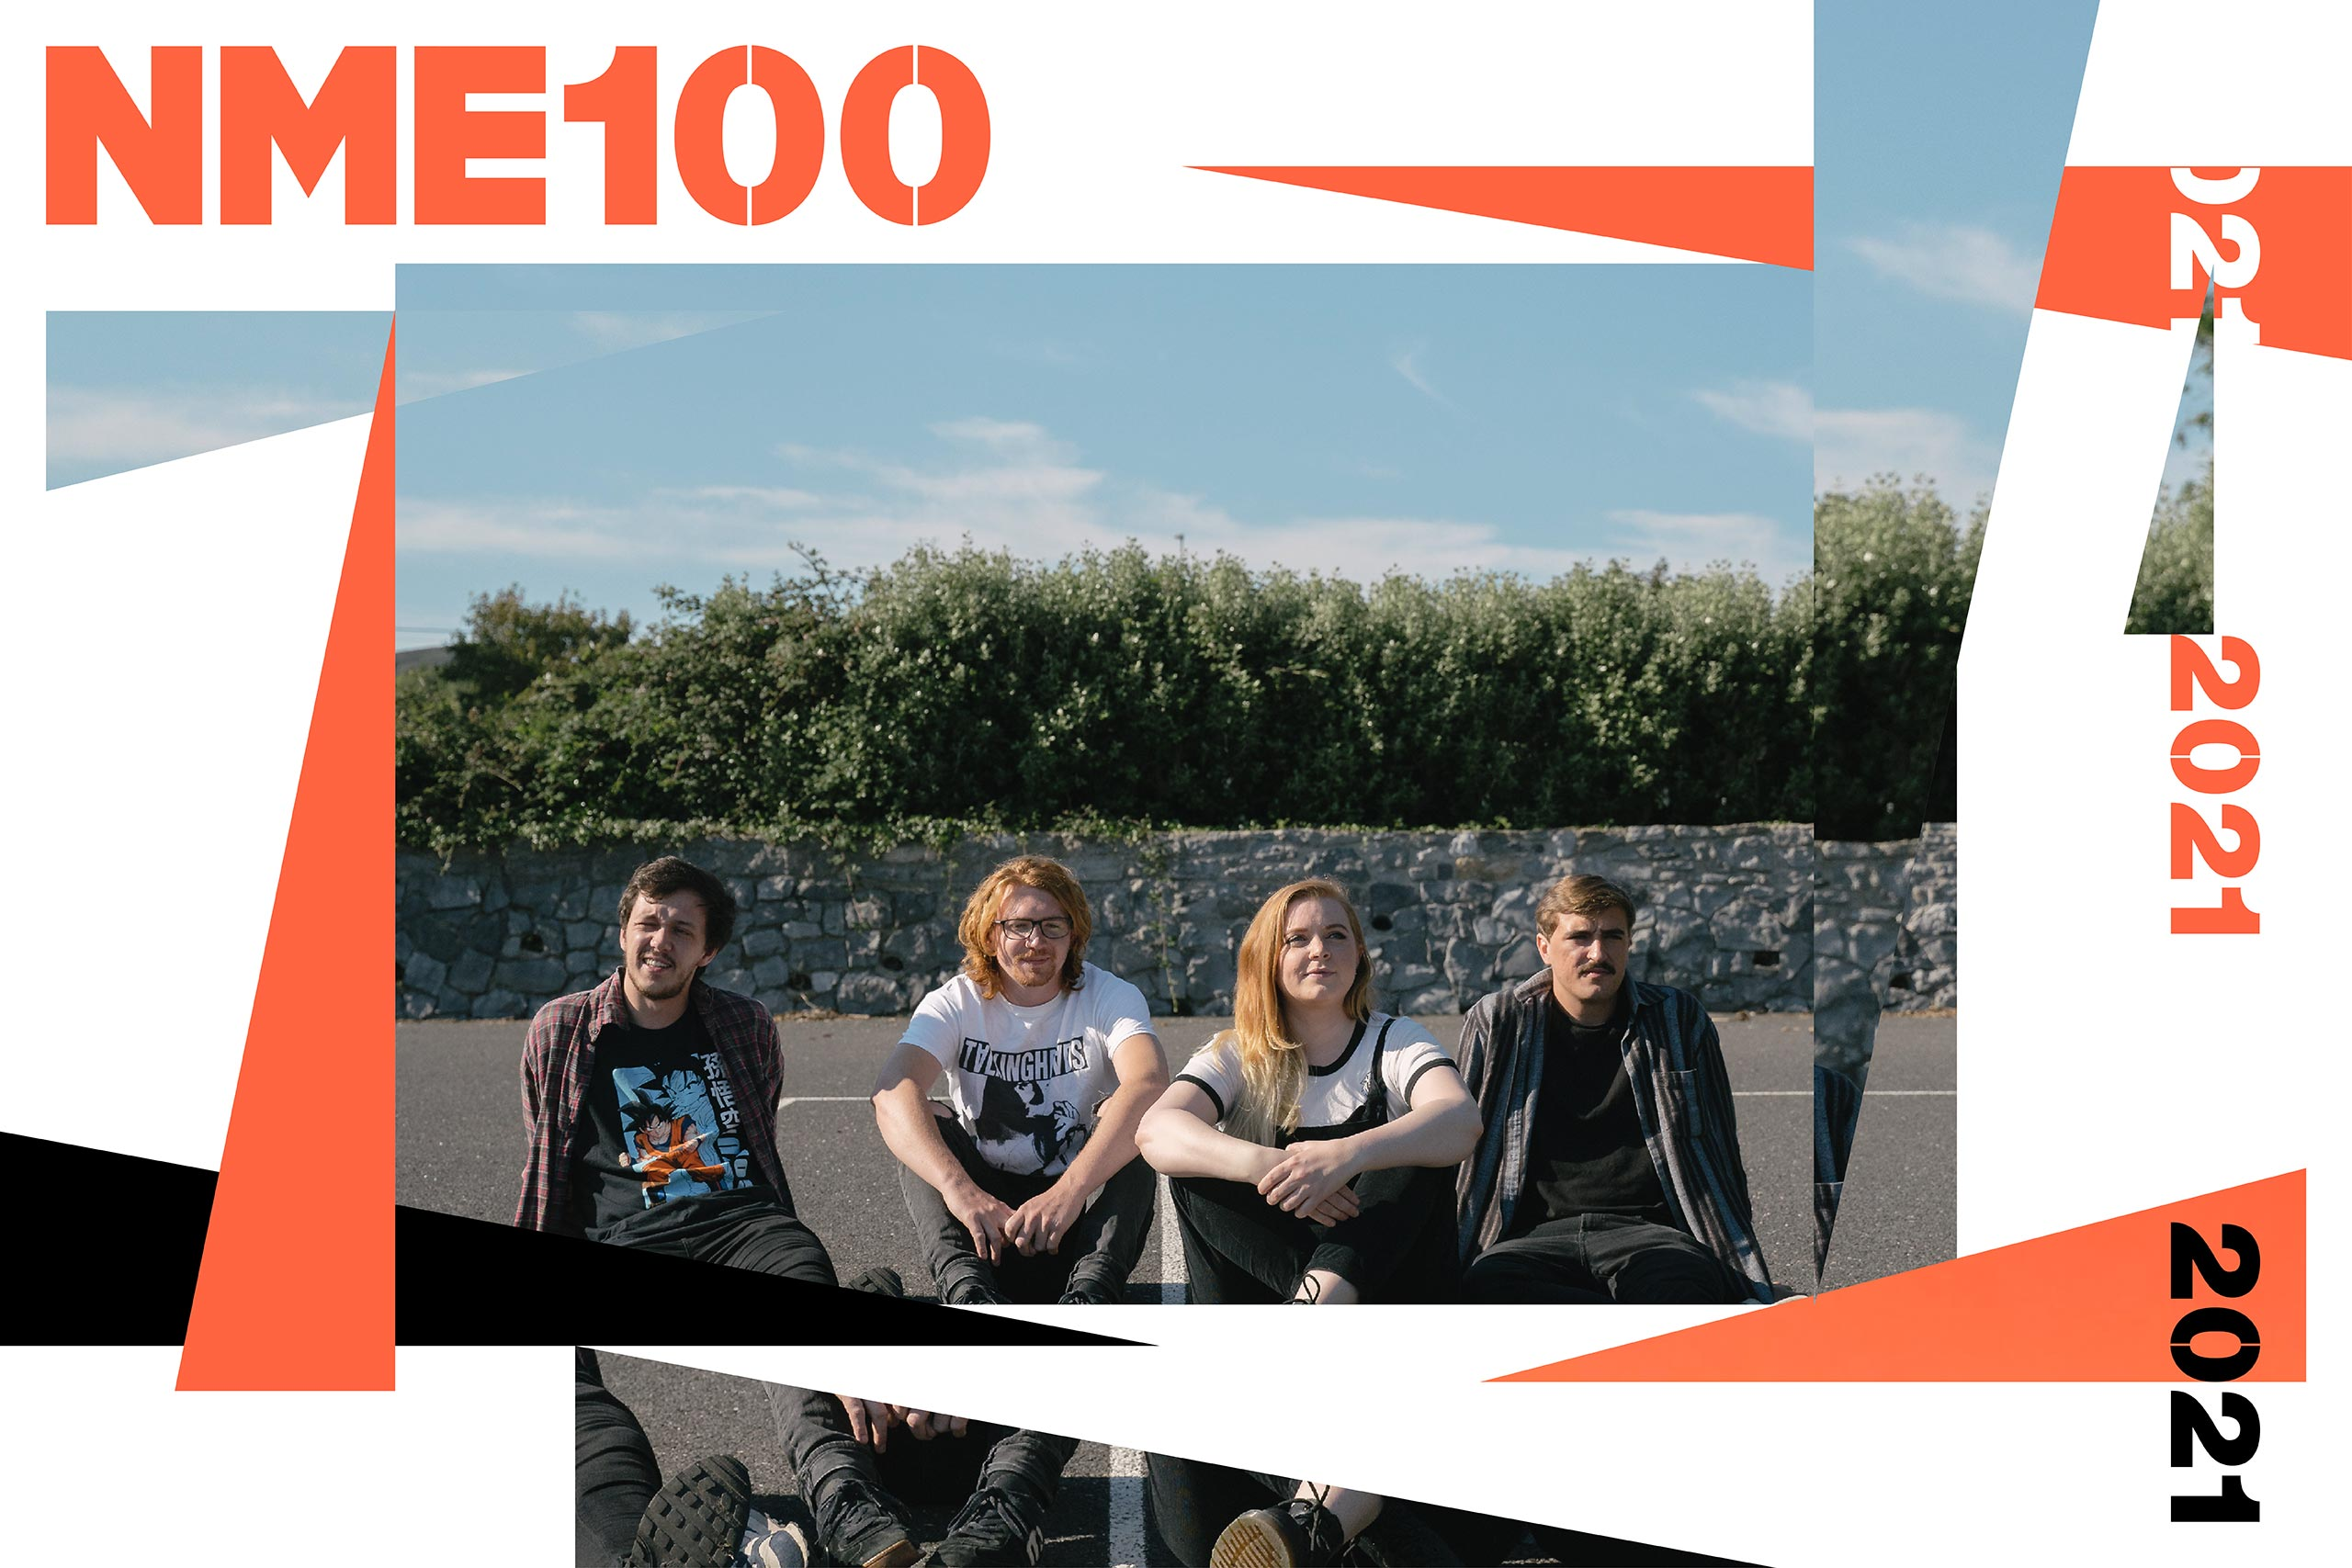 NME 100 sprints